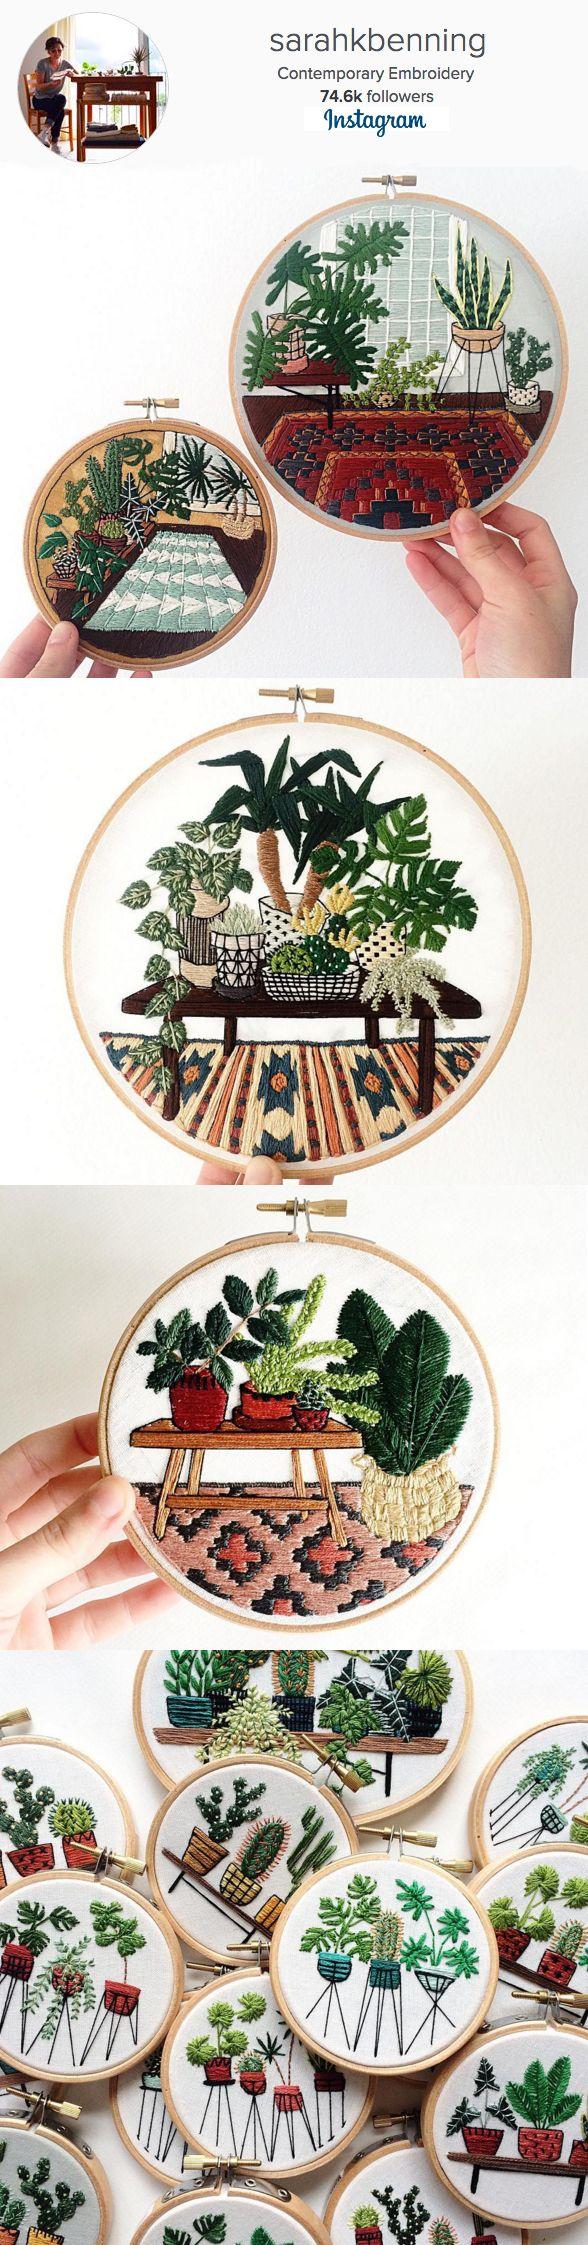 Sarah K Benning, Contemporary Embroidery | Instagram